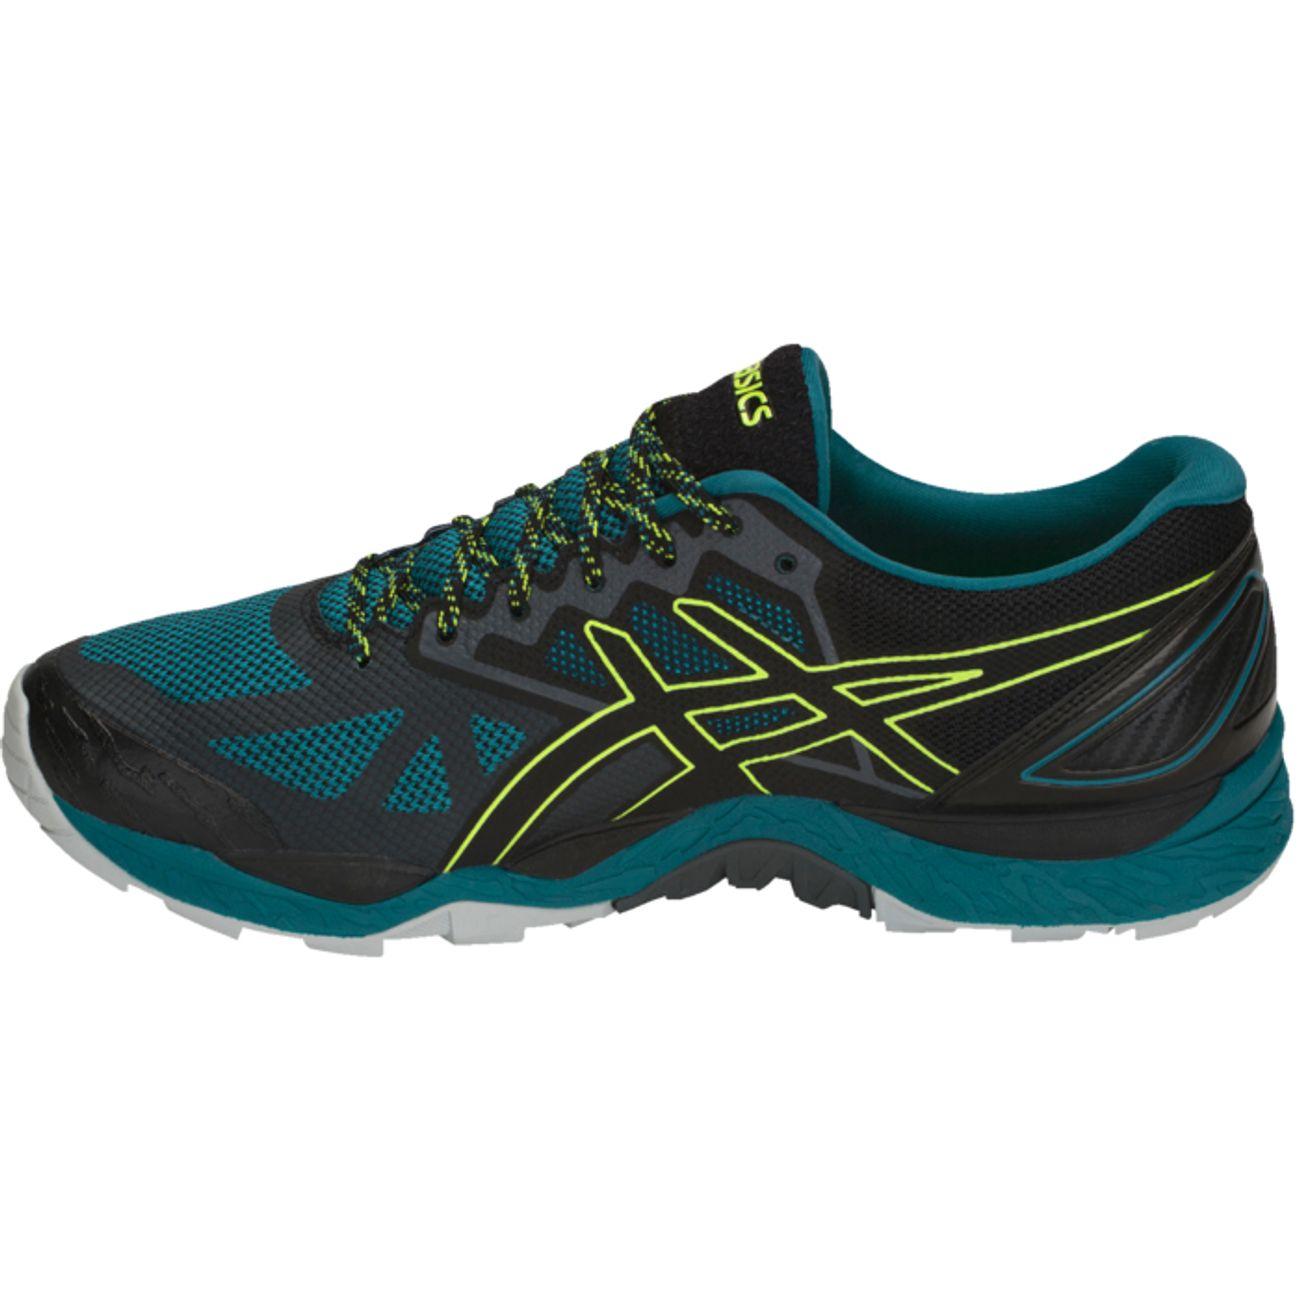 Gel Asics 6 Basses Fujitrabuco Running Chaussures Homme 2I9HYWDE